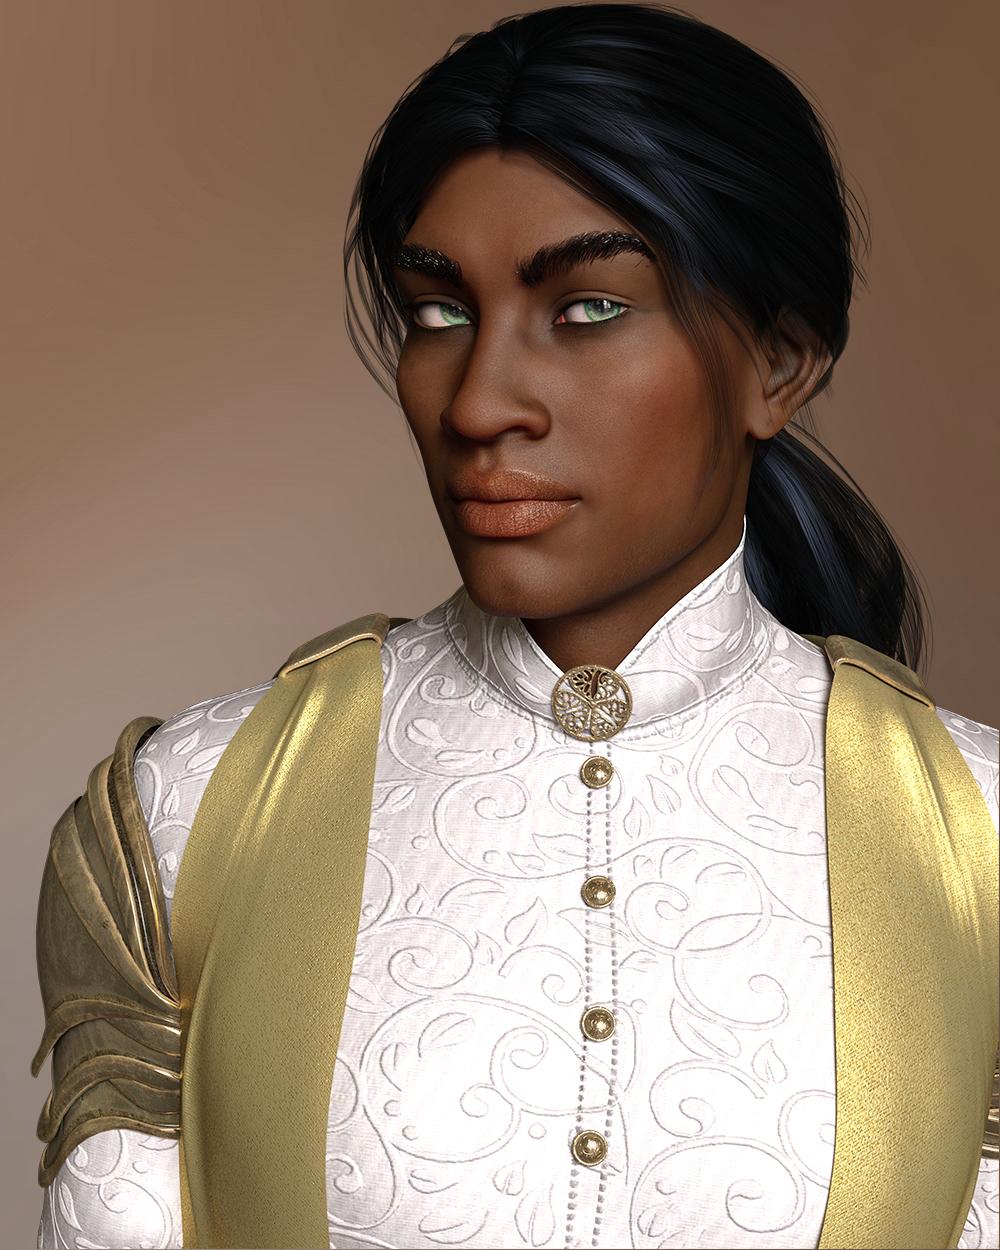 Astraeus for Ashan 8 by: TwiztedMetal, 3D Models by Daz 3D